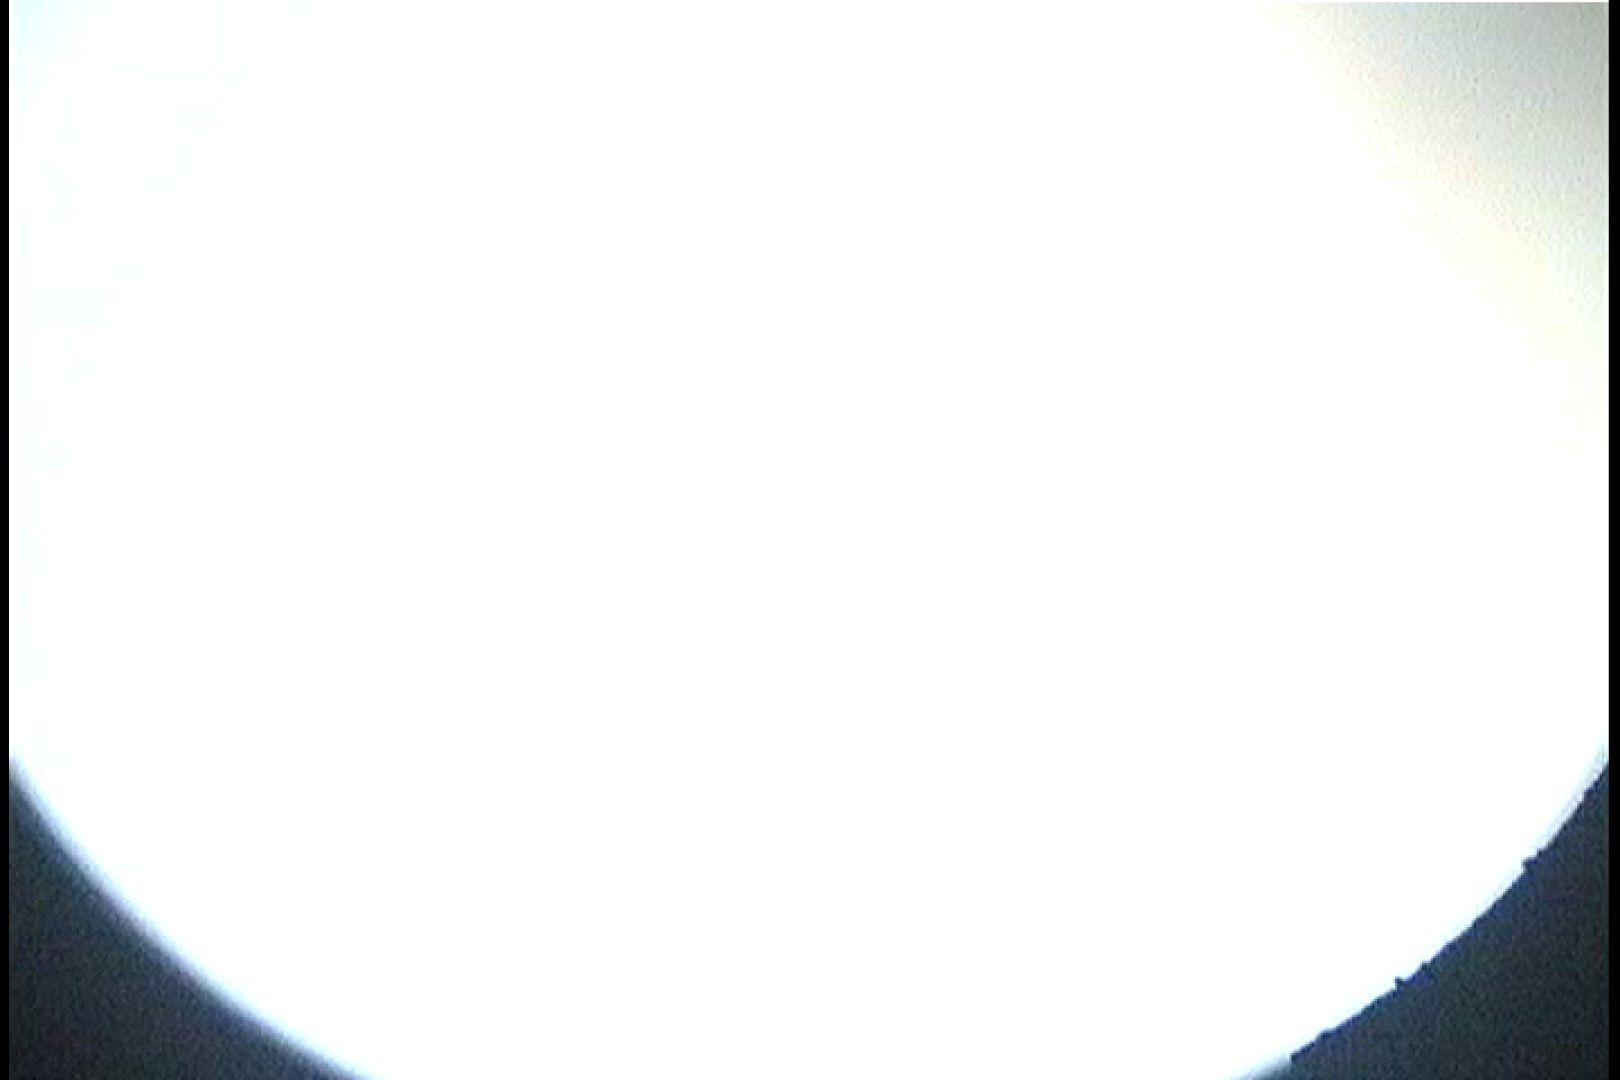 No.53 金髪ギャルの乳首に向かってズームイン 接写 濡れ場動画紹介 109枚 54